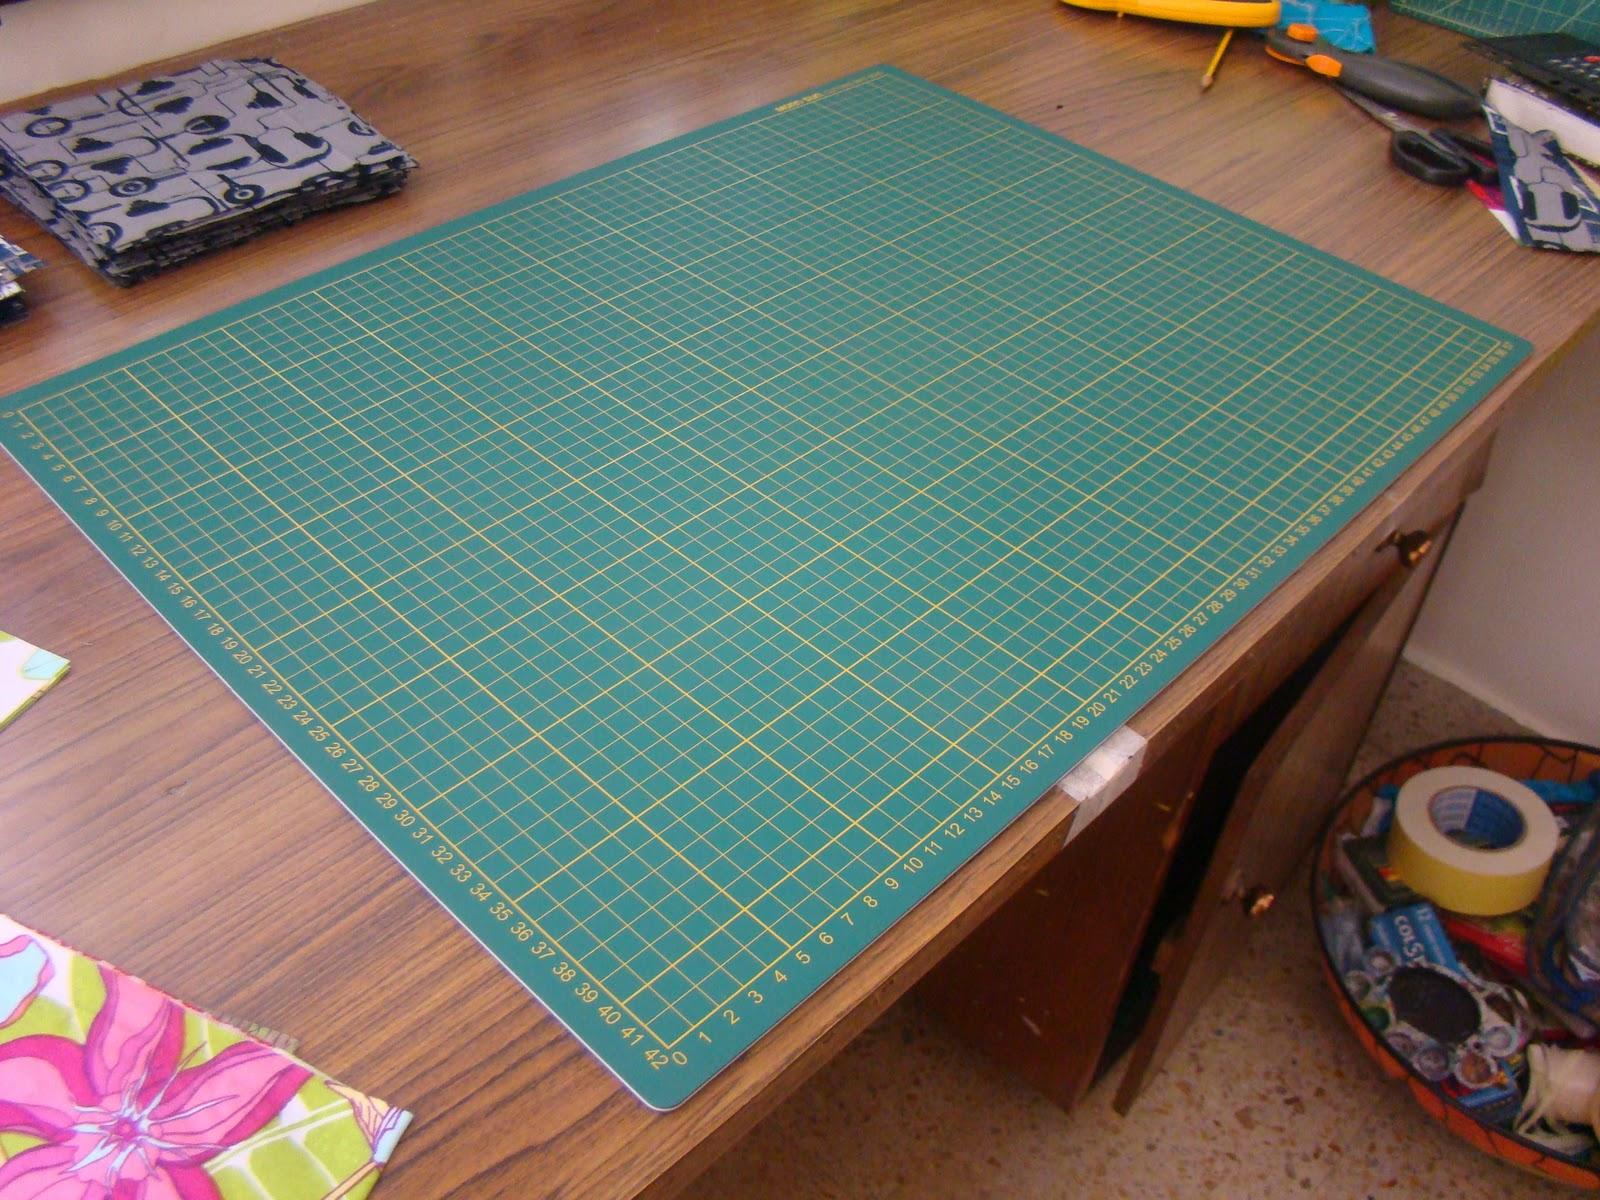 Quilting in India: Found a cutting mat.